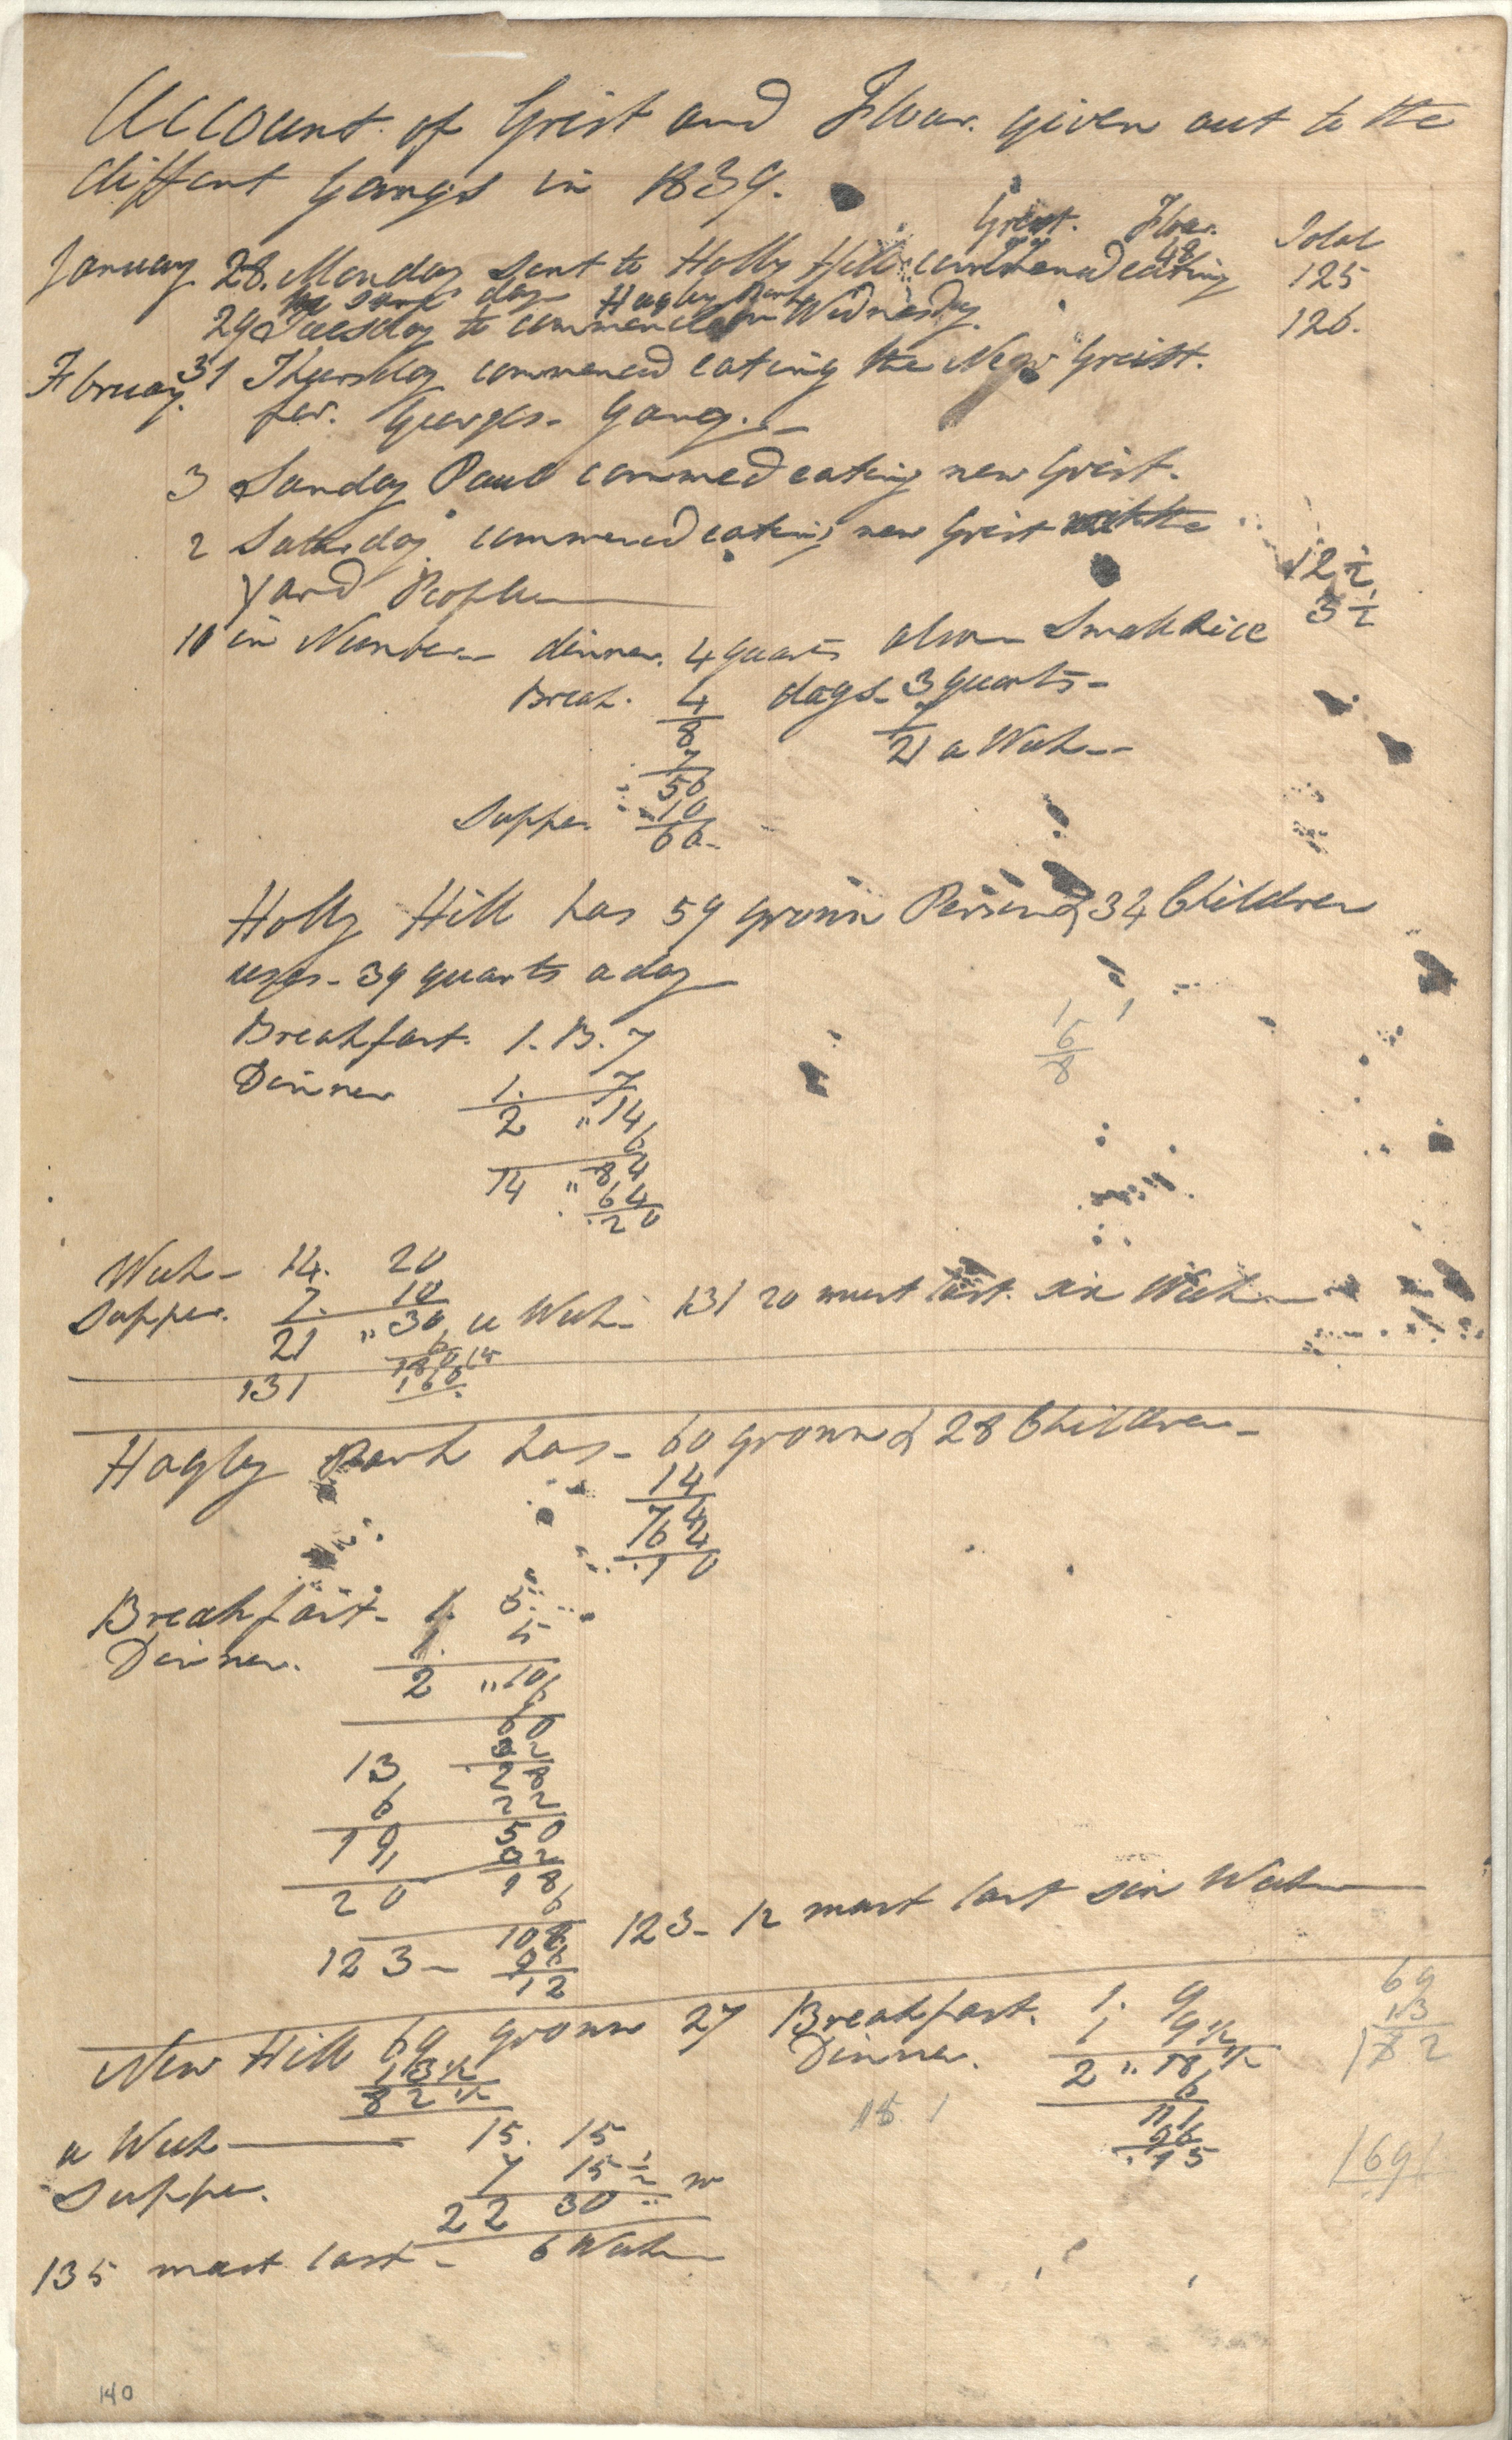 Plowden Weston's Business Ledger, Plantation Records 2